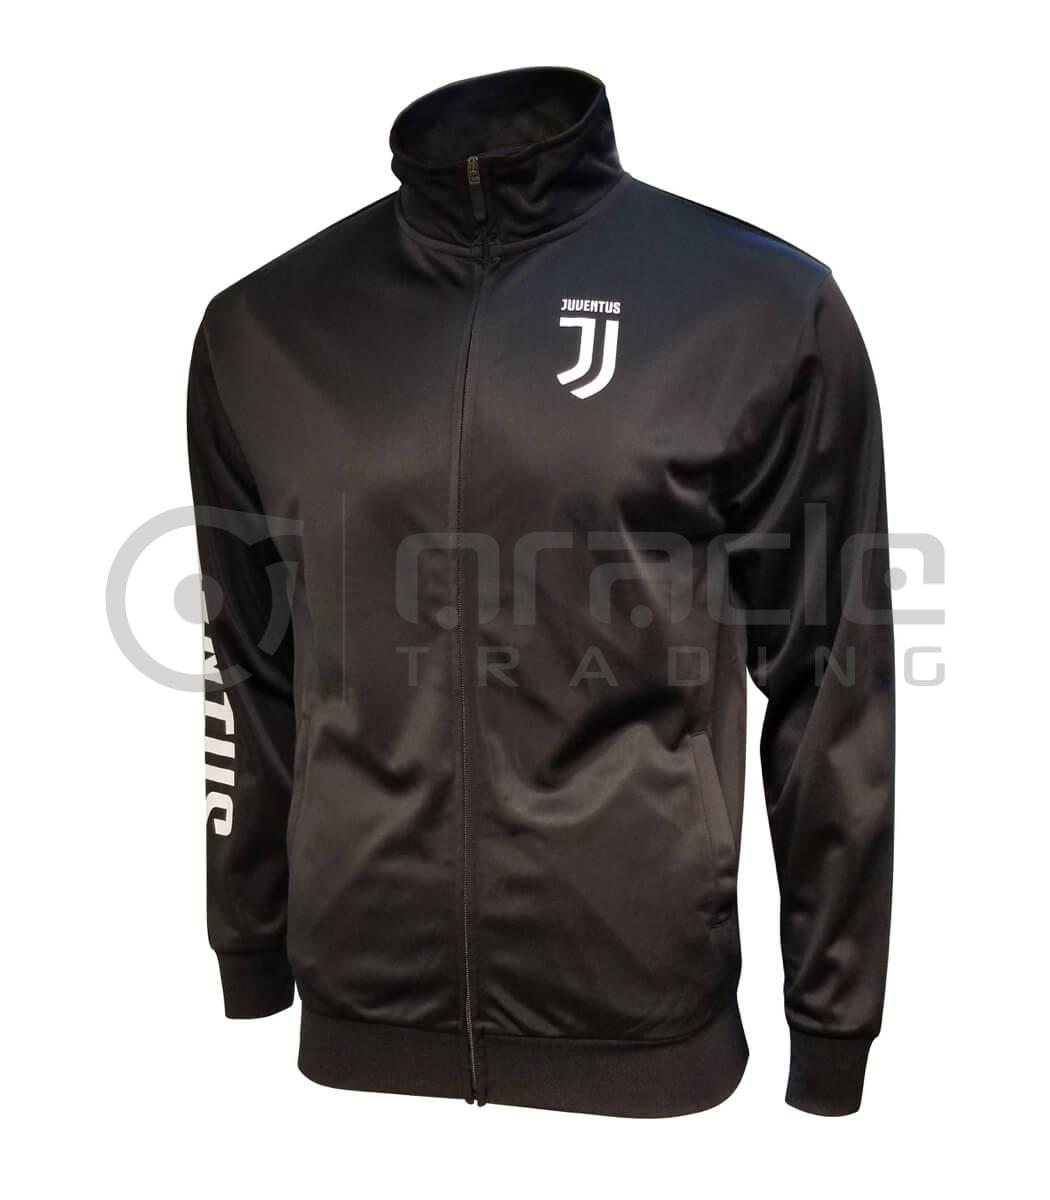 Juventus Track Jacket (Adult)